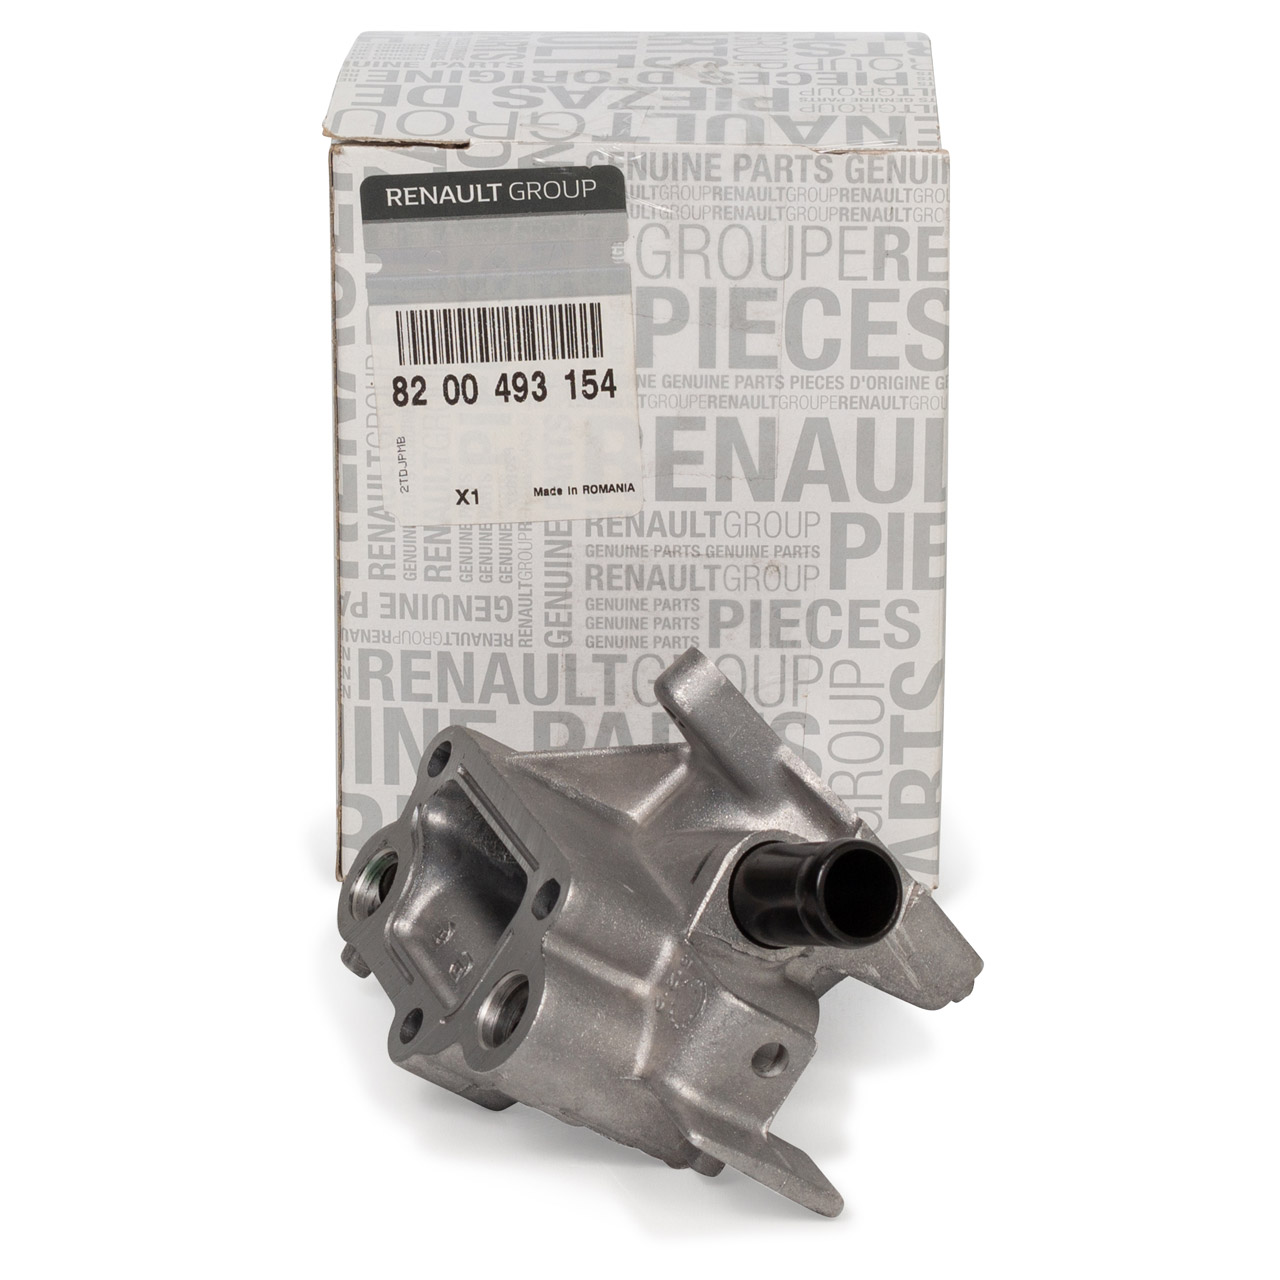 ORIGINAL Renault Thermostatgehäuse Kühlmittelflansch KANGOO 1.6 87 PS 8200493154